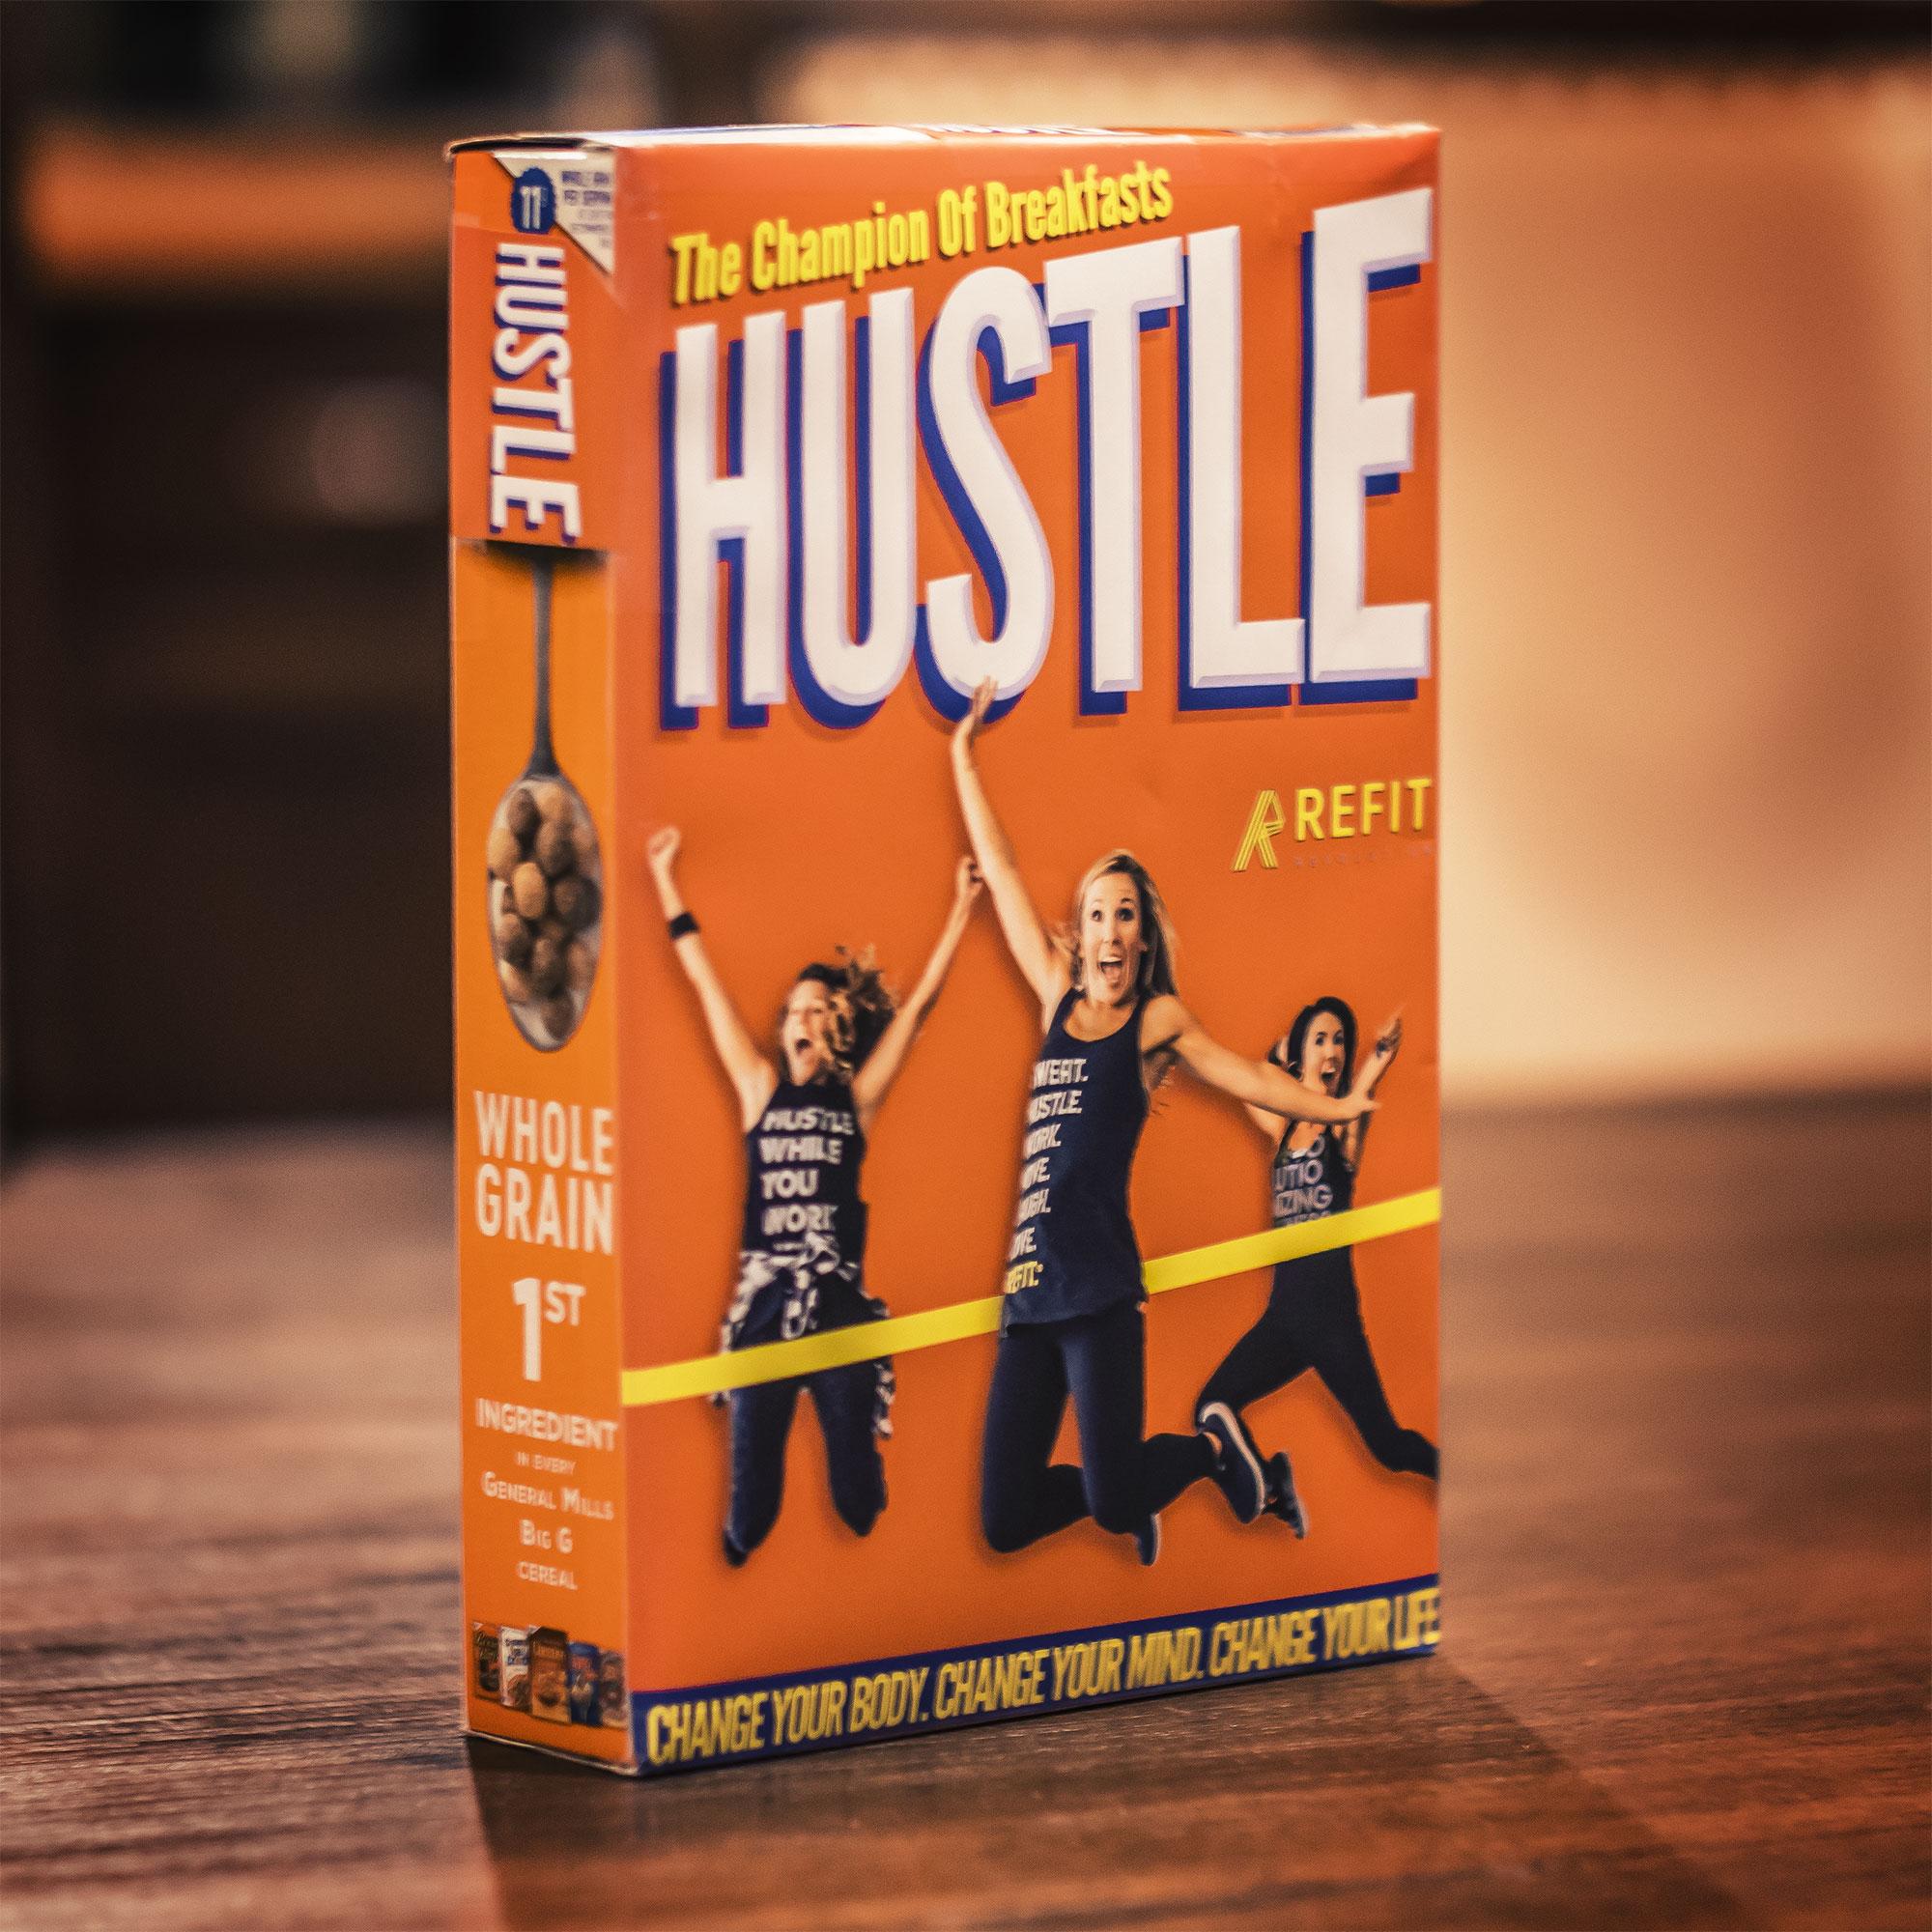 hustle-cereal.jpg